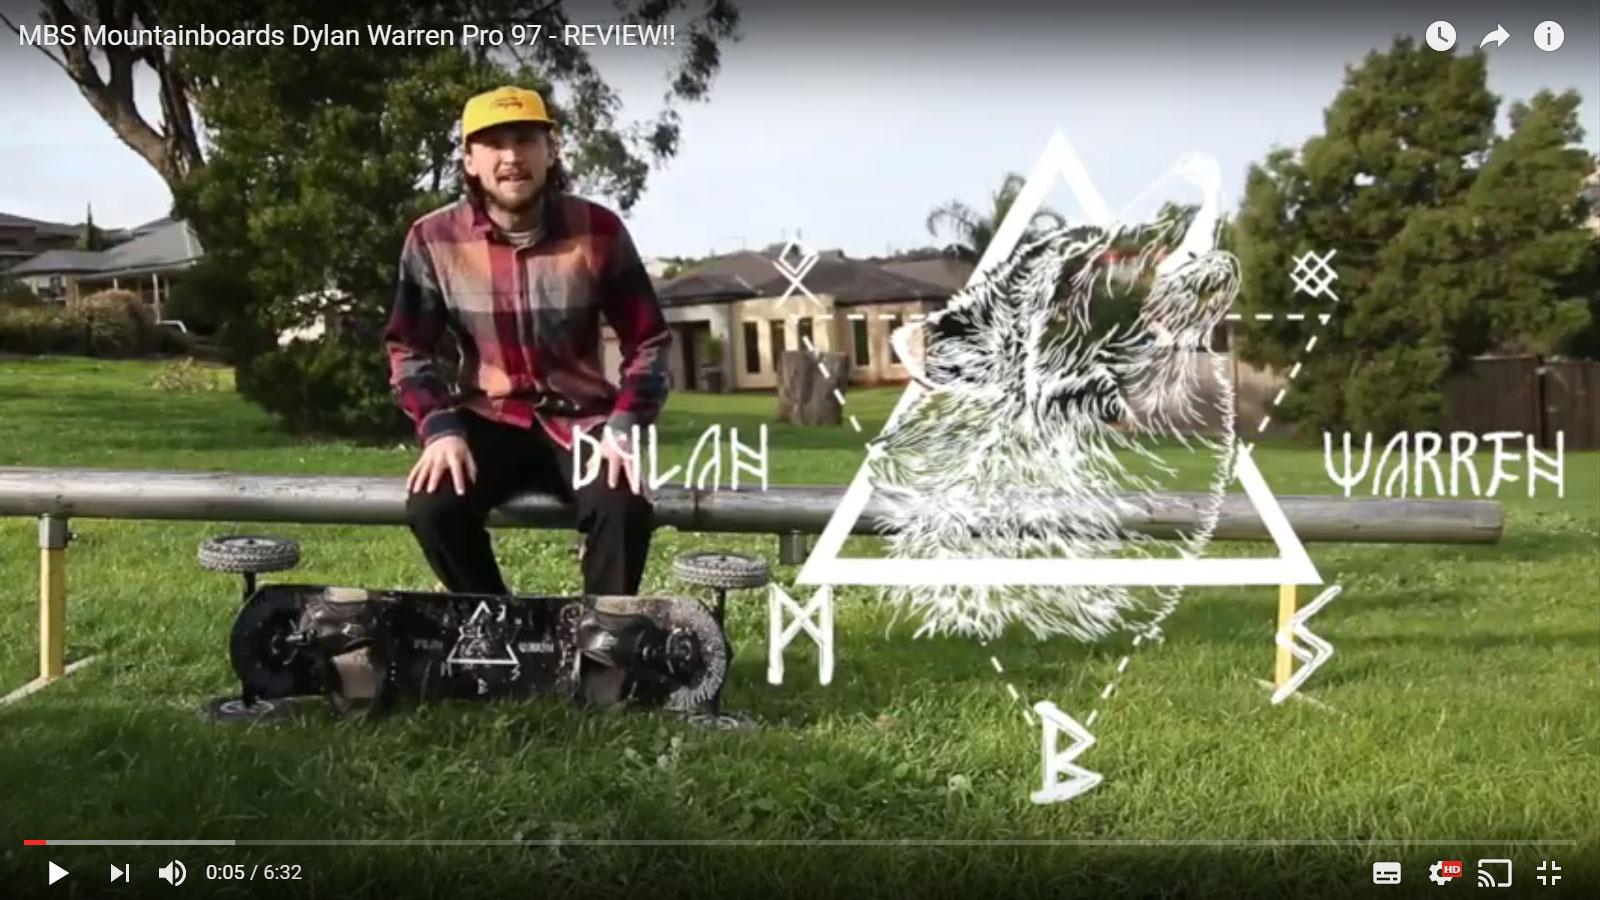 Dylan Warren MBS Pro 97 review